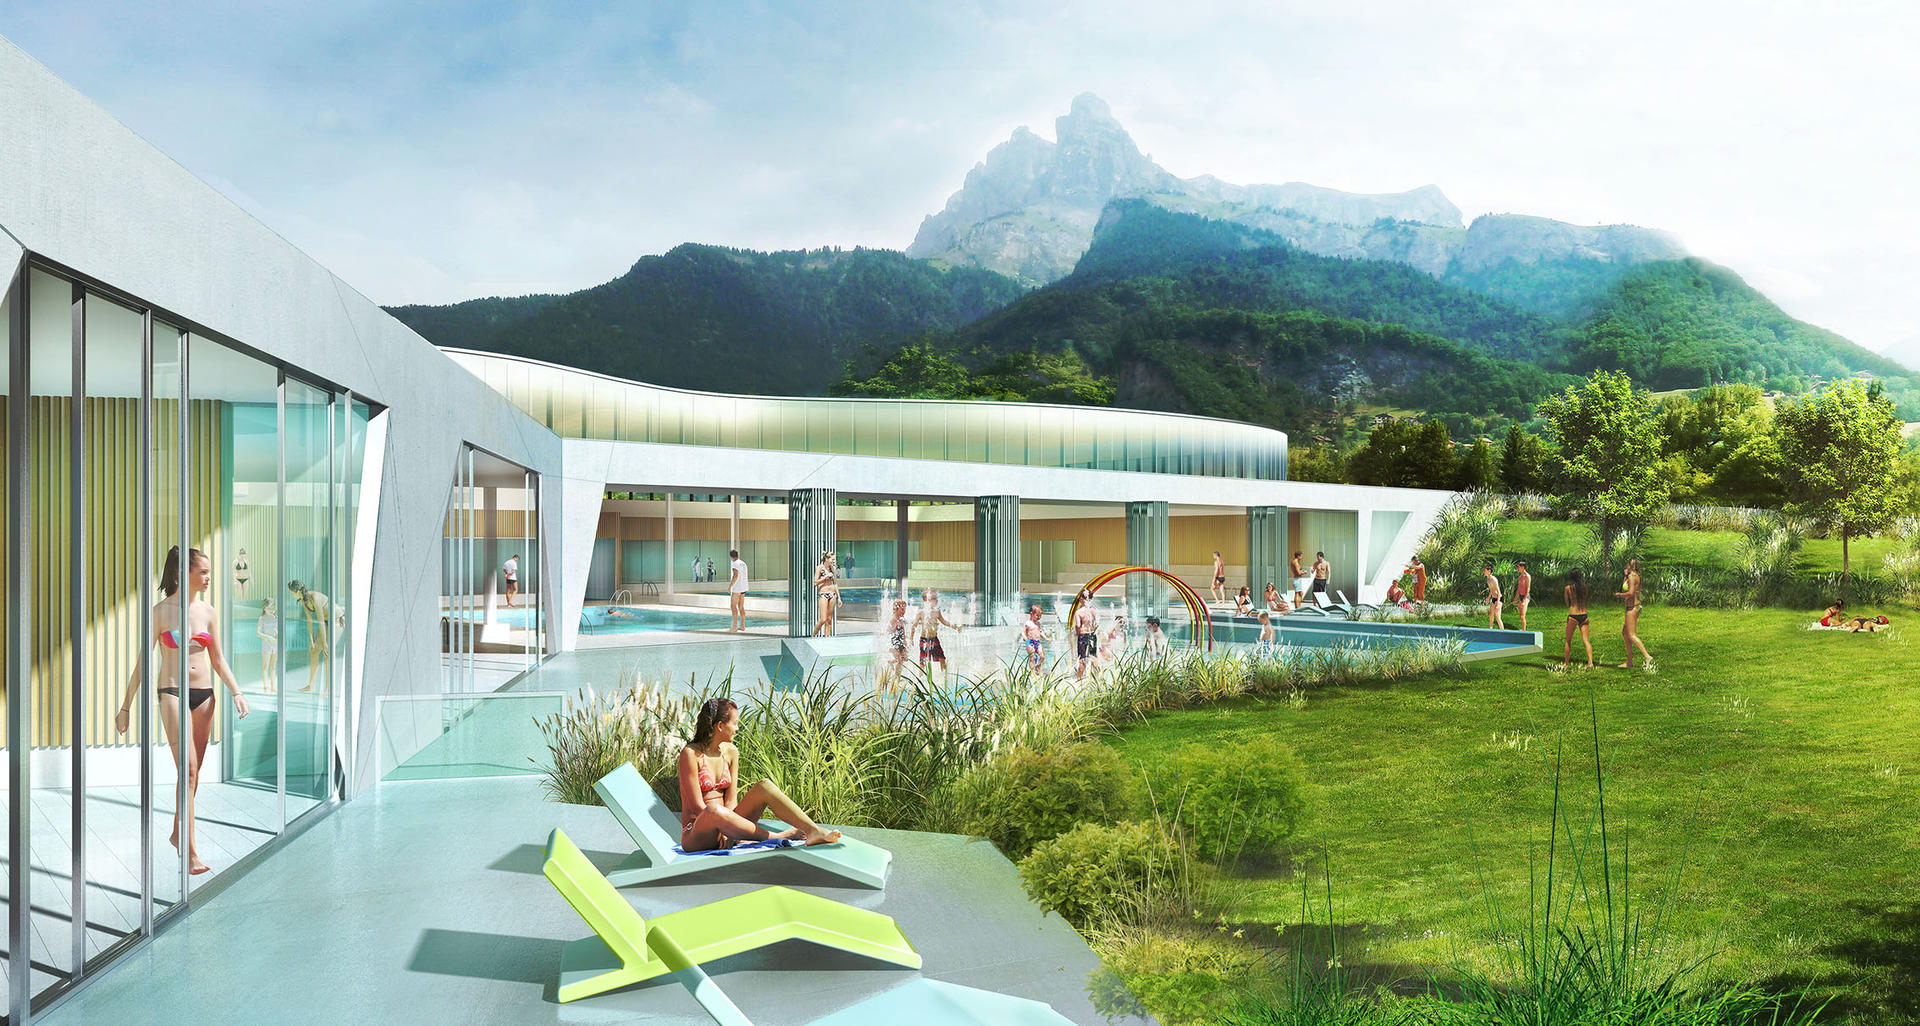 Le Centre Aquatique De Sallanches - Ville De Sallanches tout Piscine Sallanches